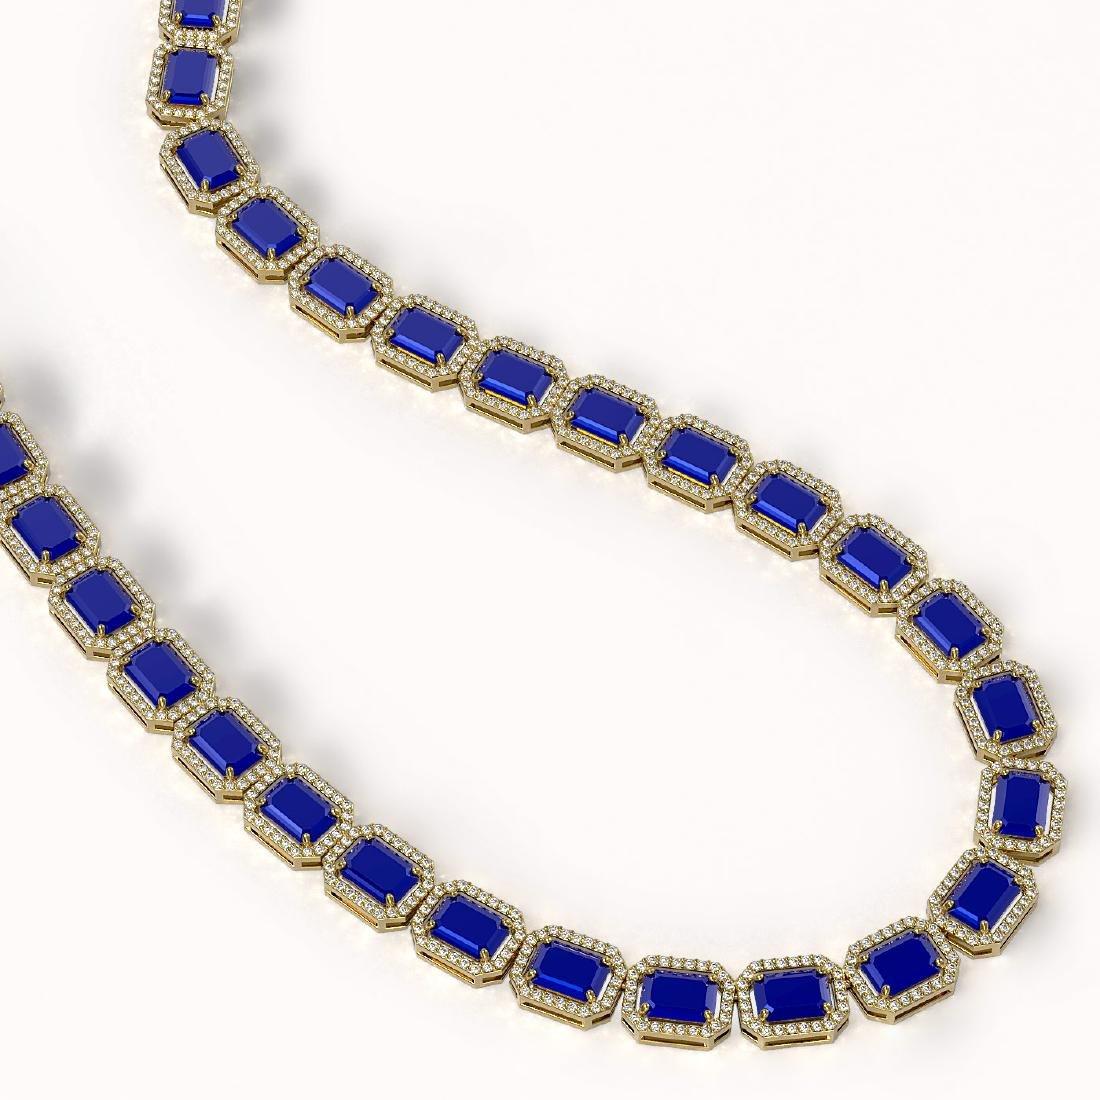 58.59 CTW Sapphire & Diamond Halo Necklace 10K Yellow - 2